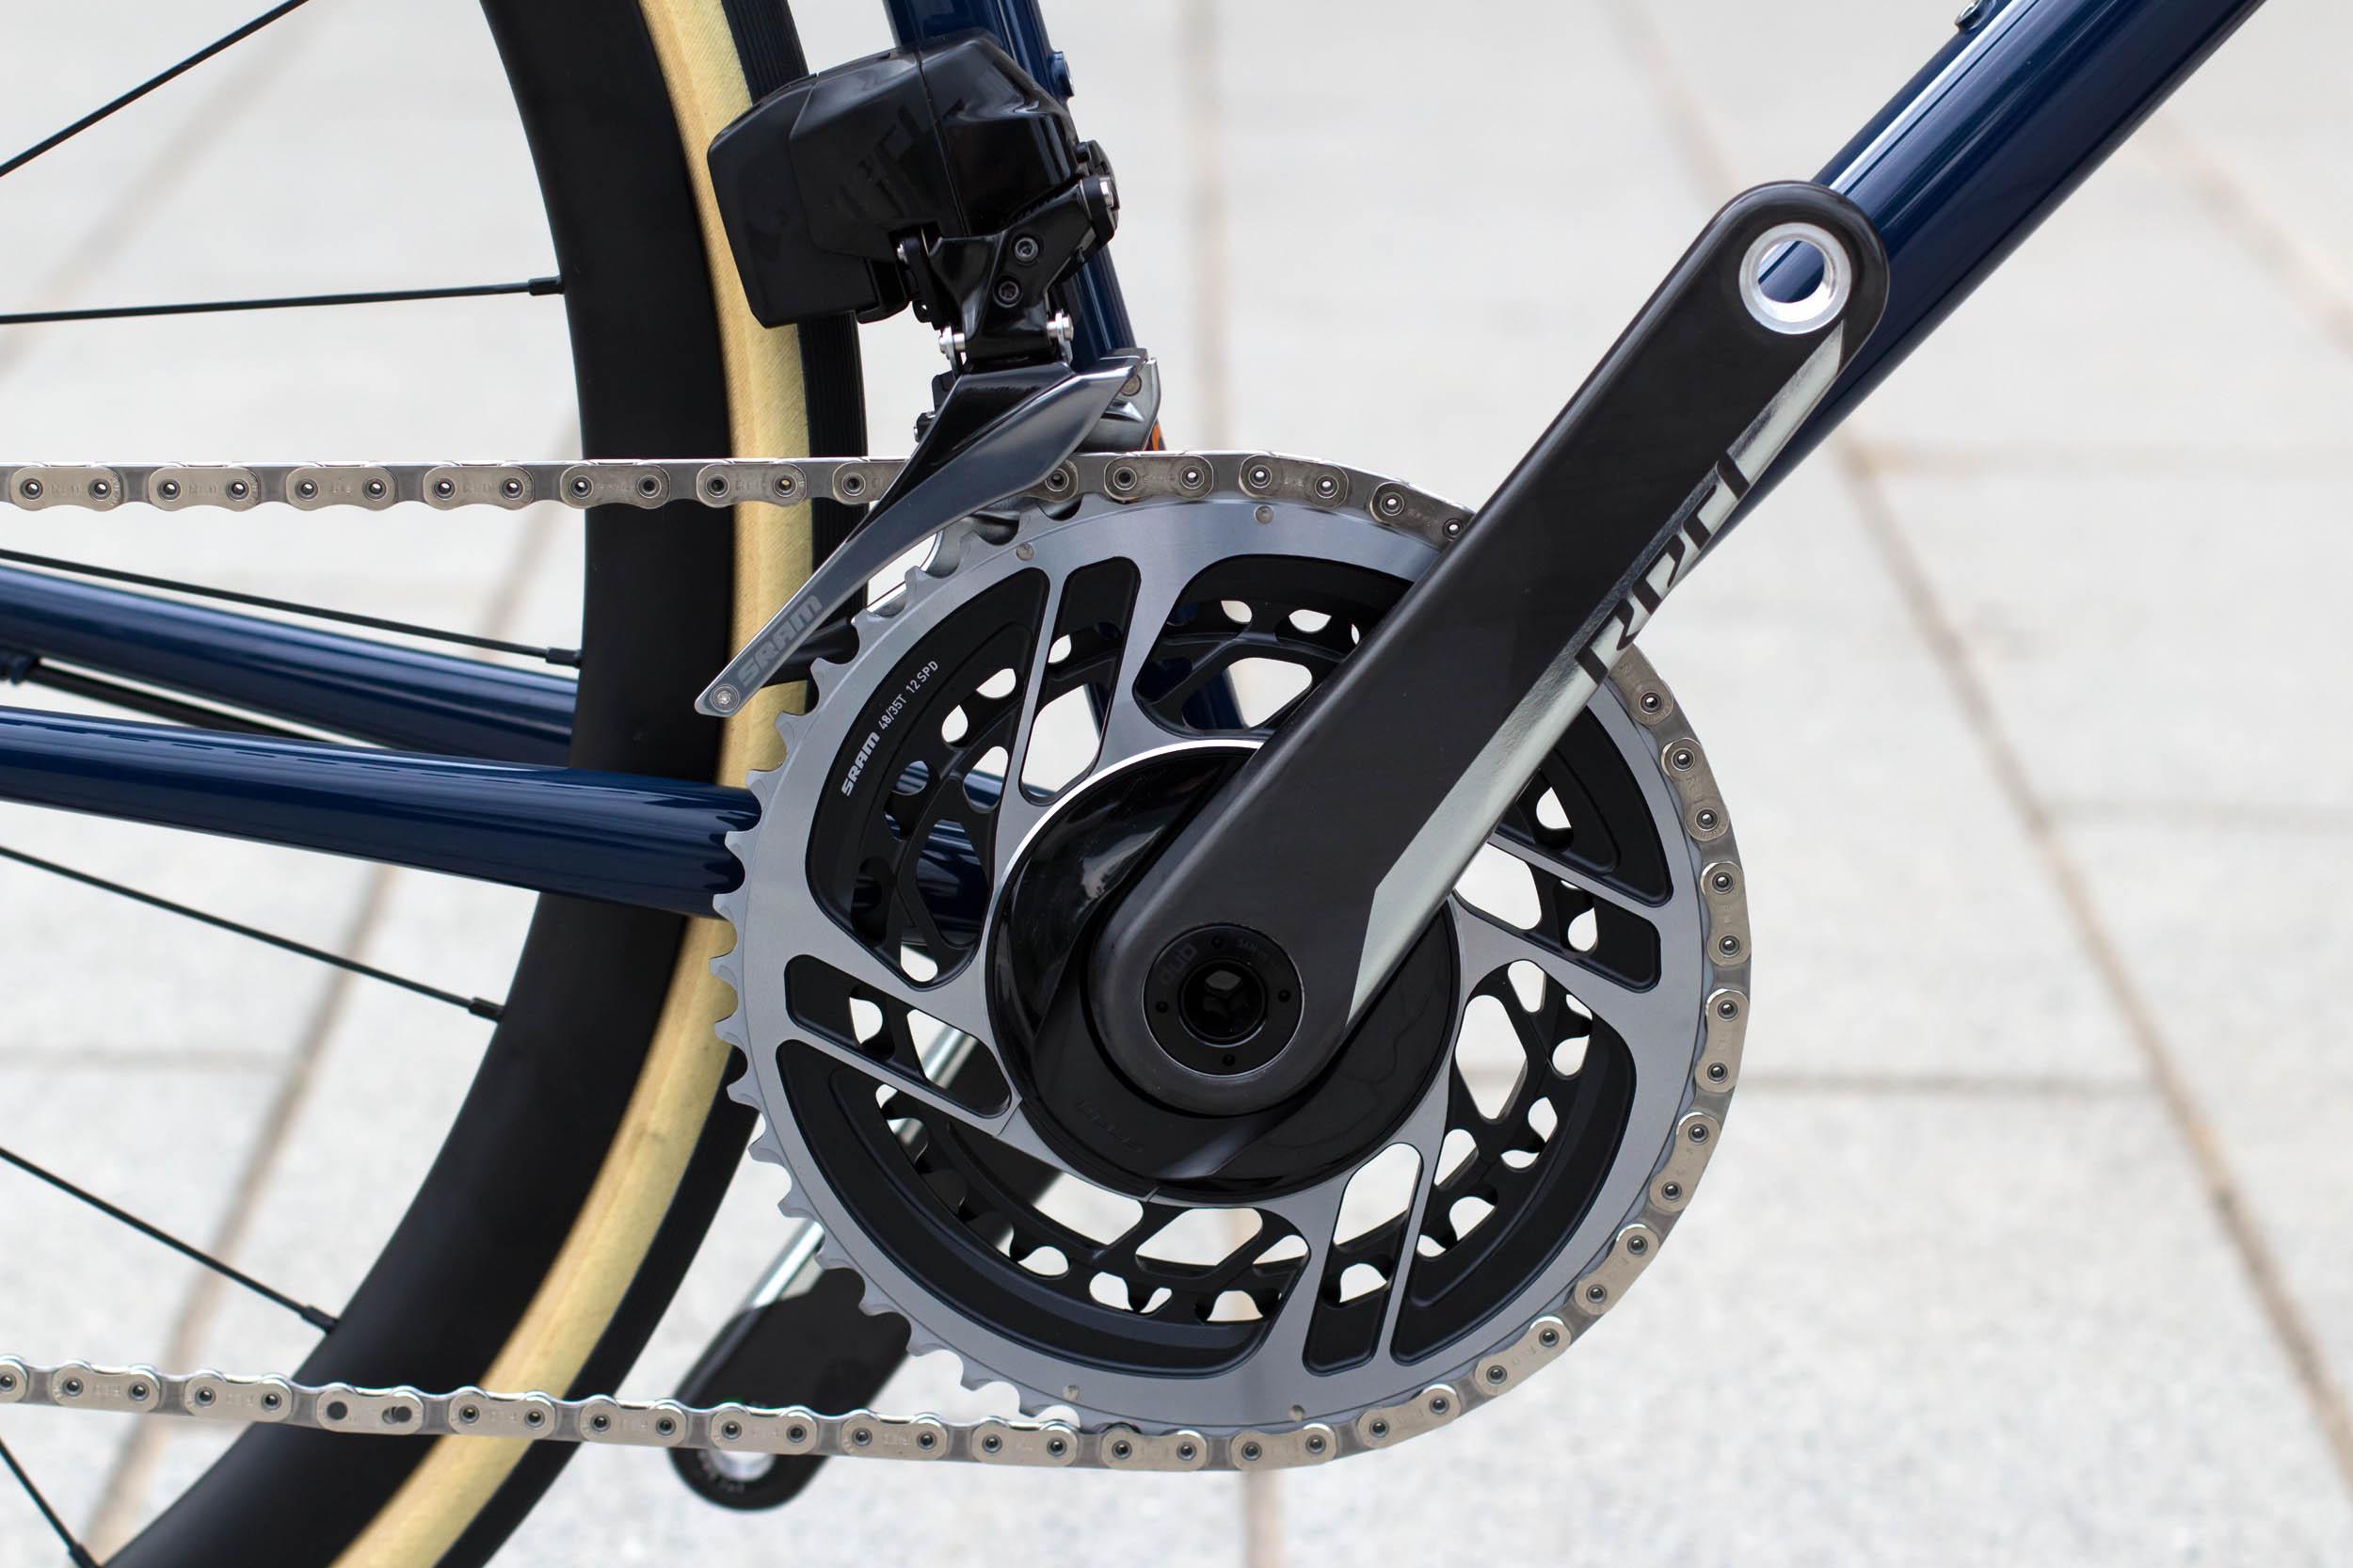 quirk_cycles_charlie_sheldon_durmitor_10.jpg